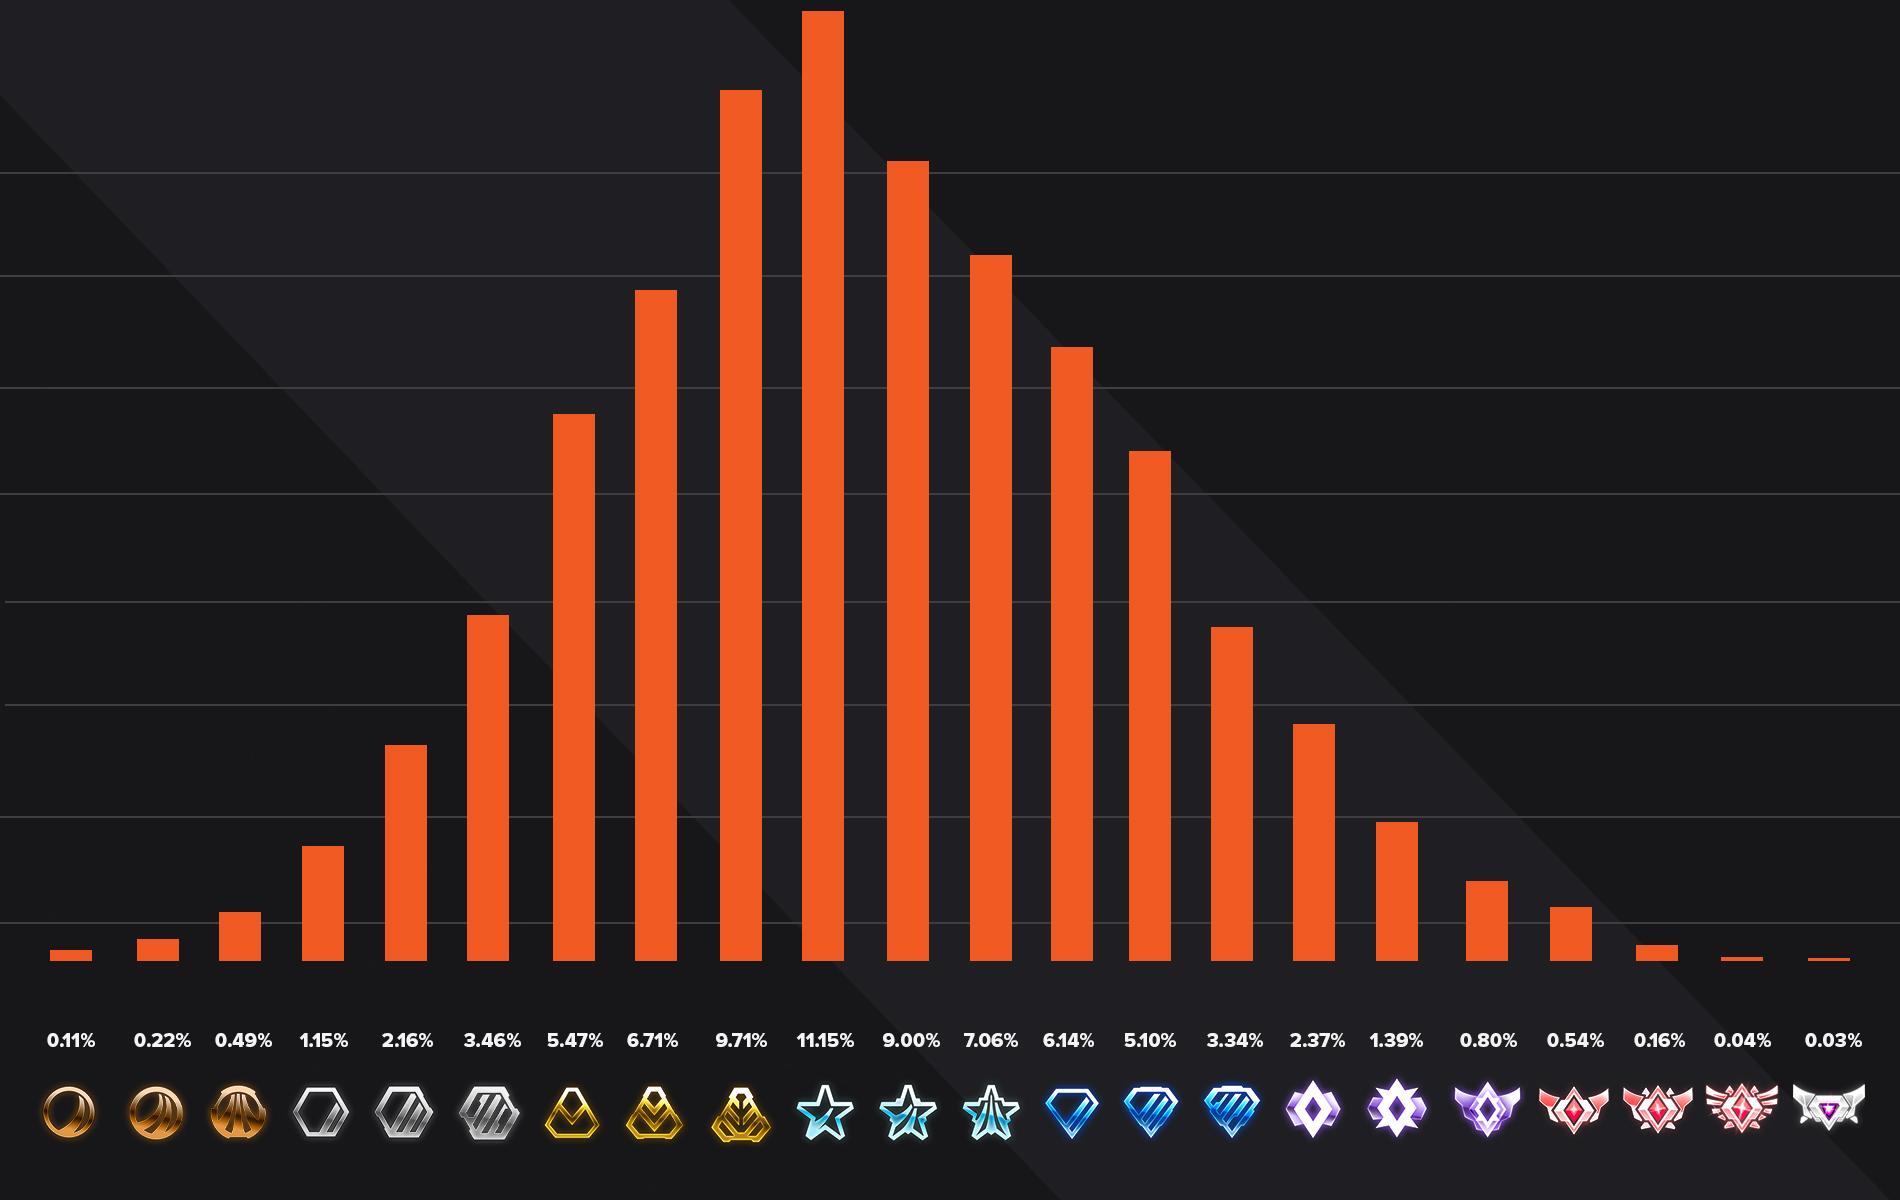 2V2 rocket league ranks distribution